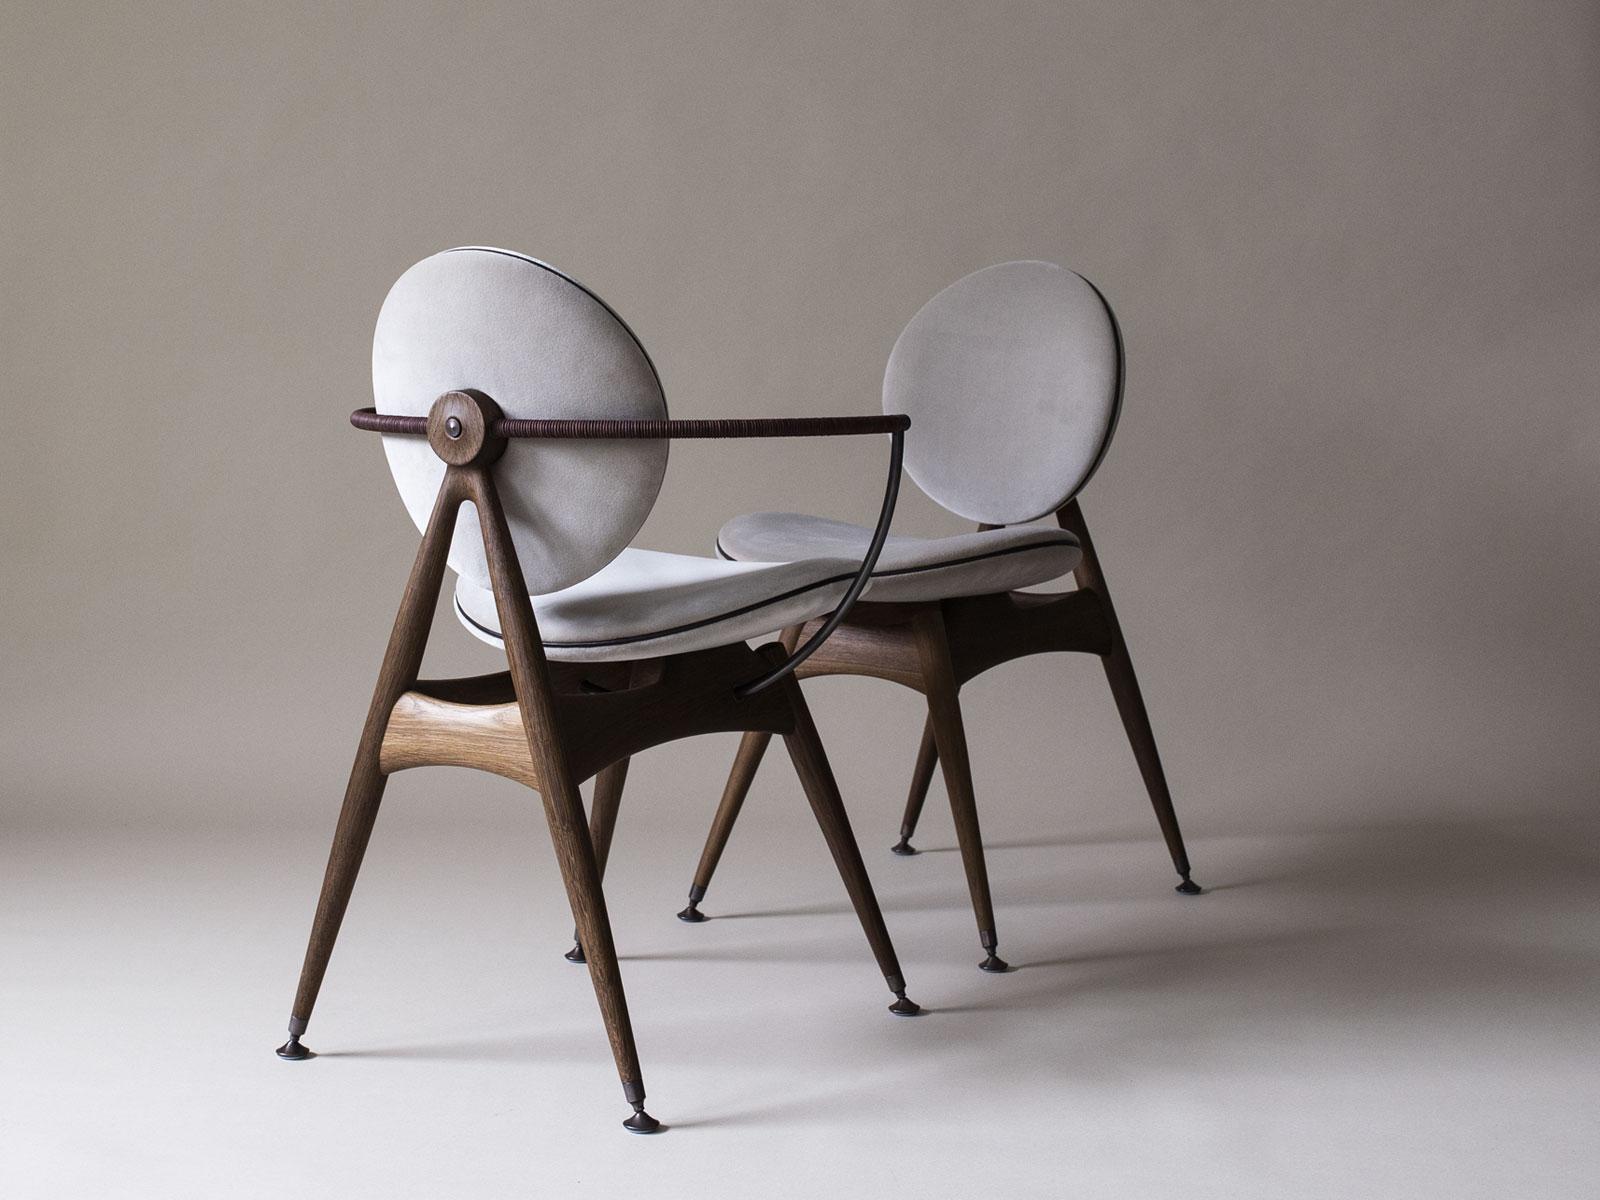 Circle-Dining-Chairs-Overgaard-Dyrman-